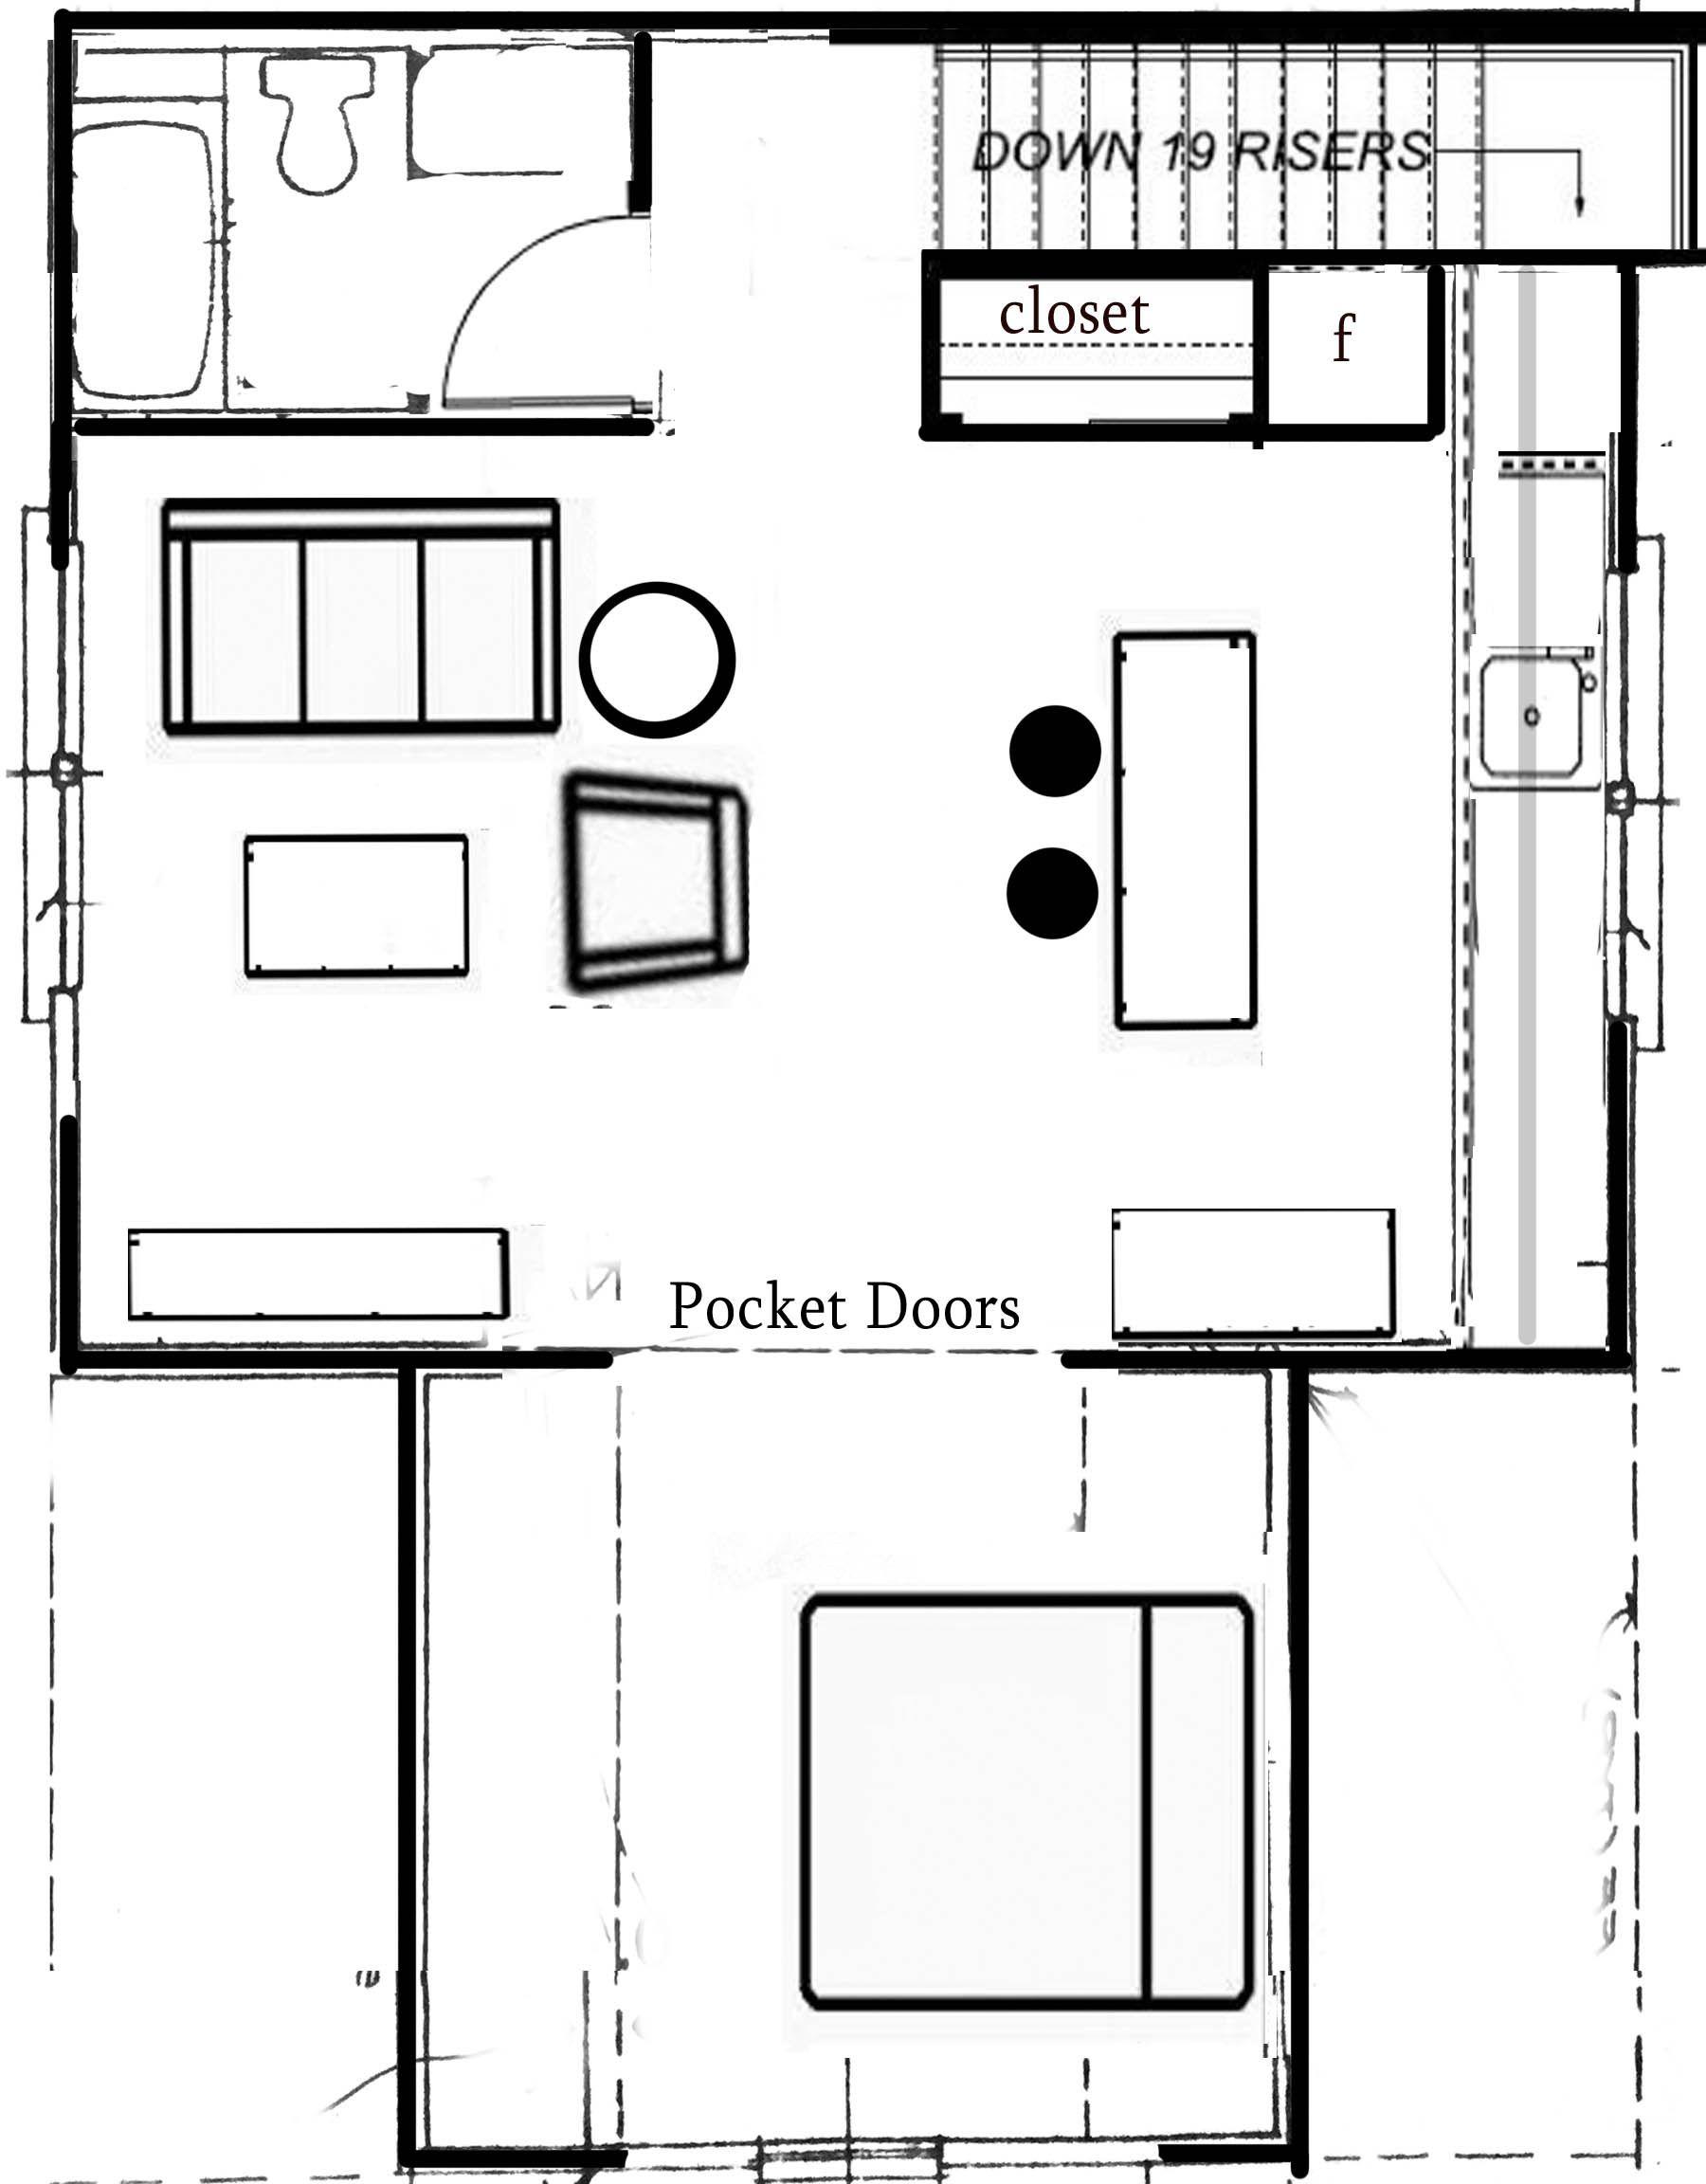 Pin by Susan Fox on Apartment | Pocket doors, Floor plans ...